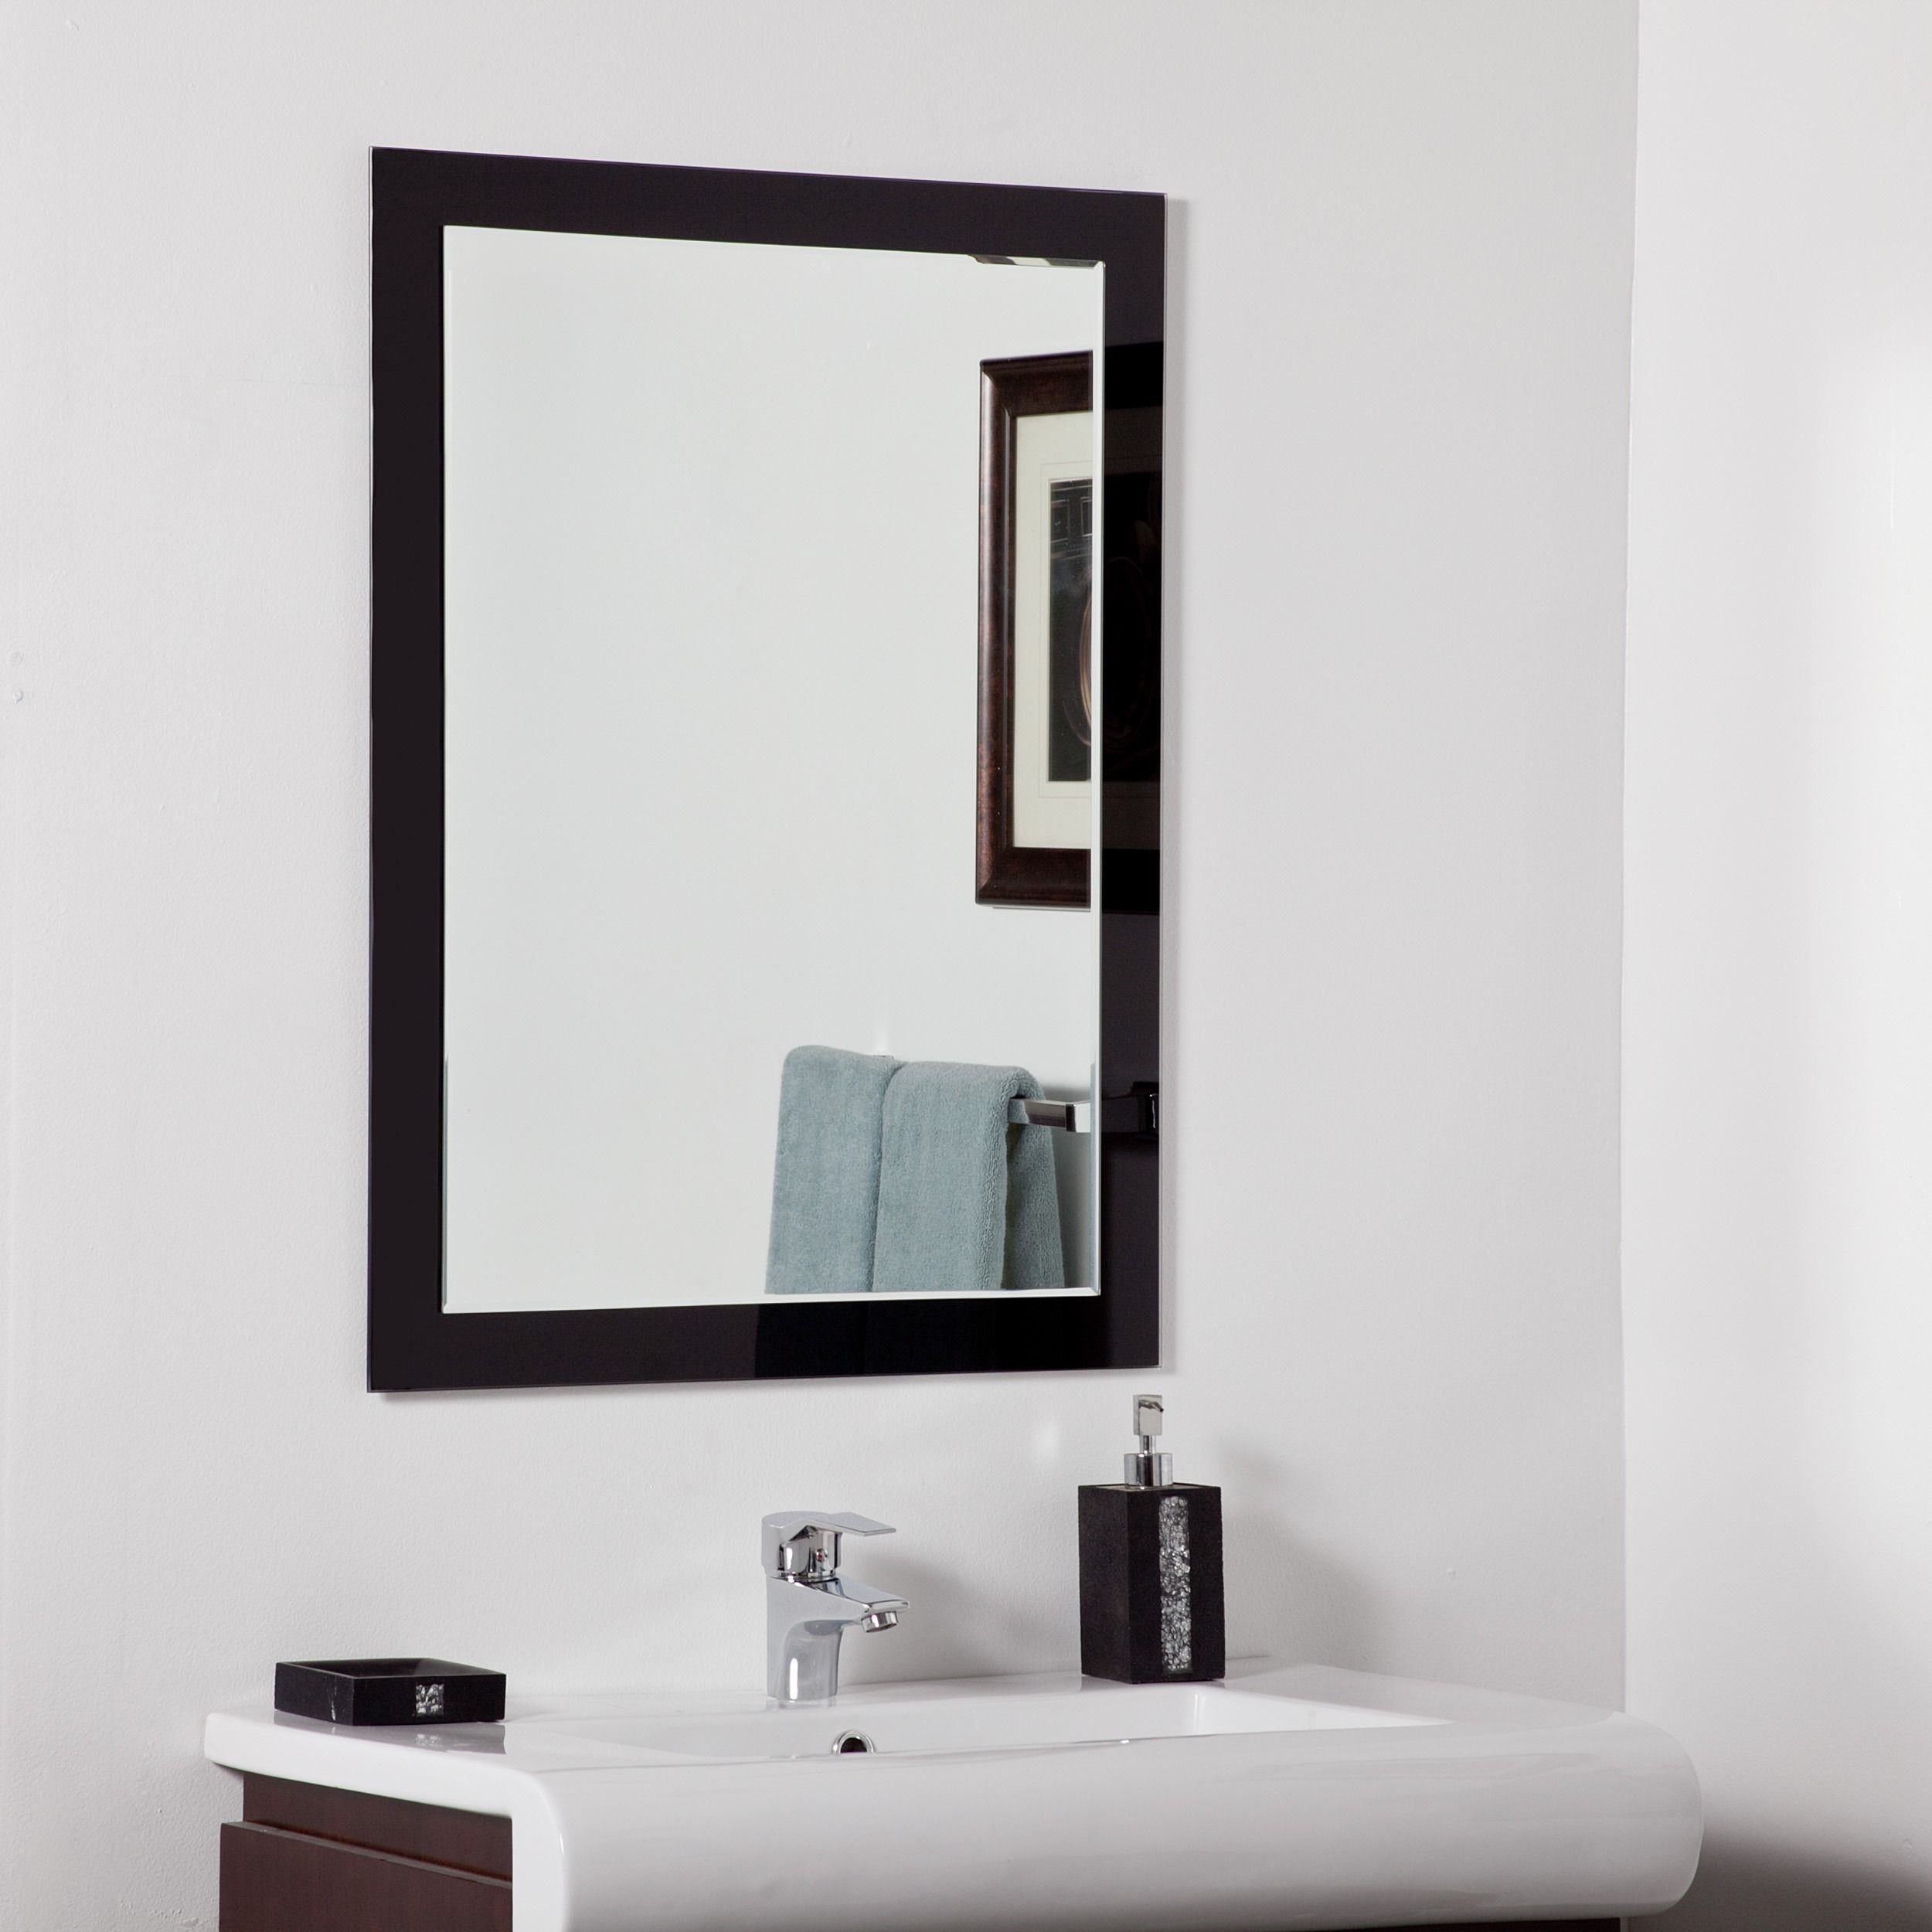 Aris Modern Bathroom Mirror, Silver, Decor Wonderland | Apartment ...